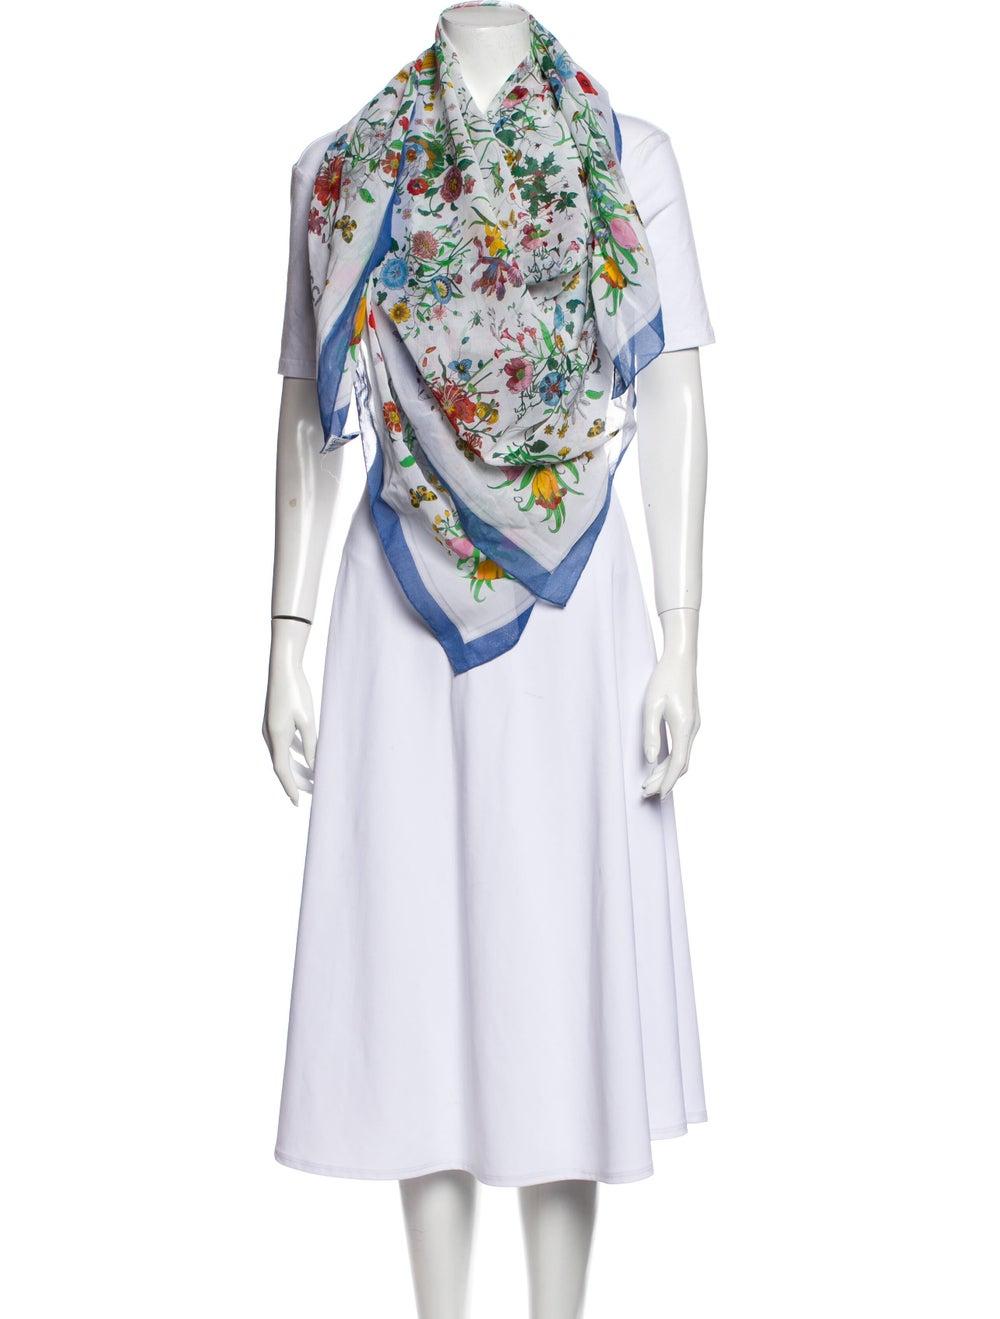 Gucci Vintage Floral Print Scarf White - image 3